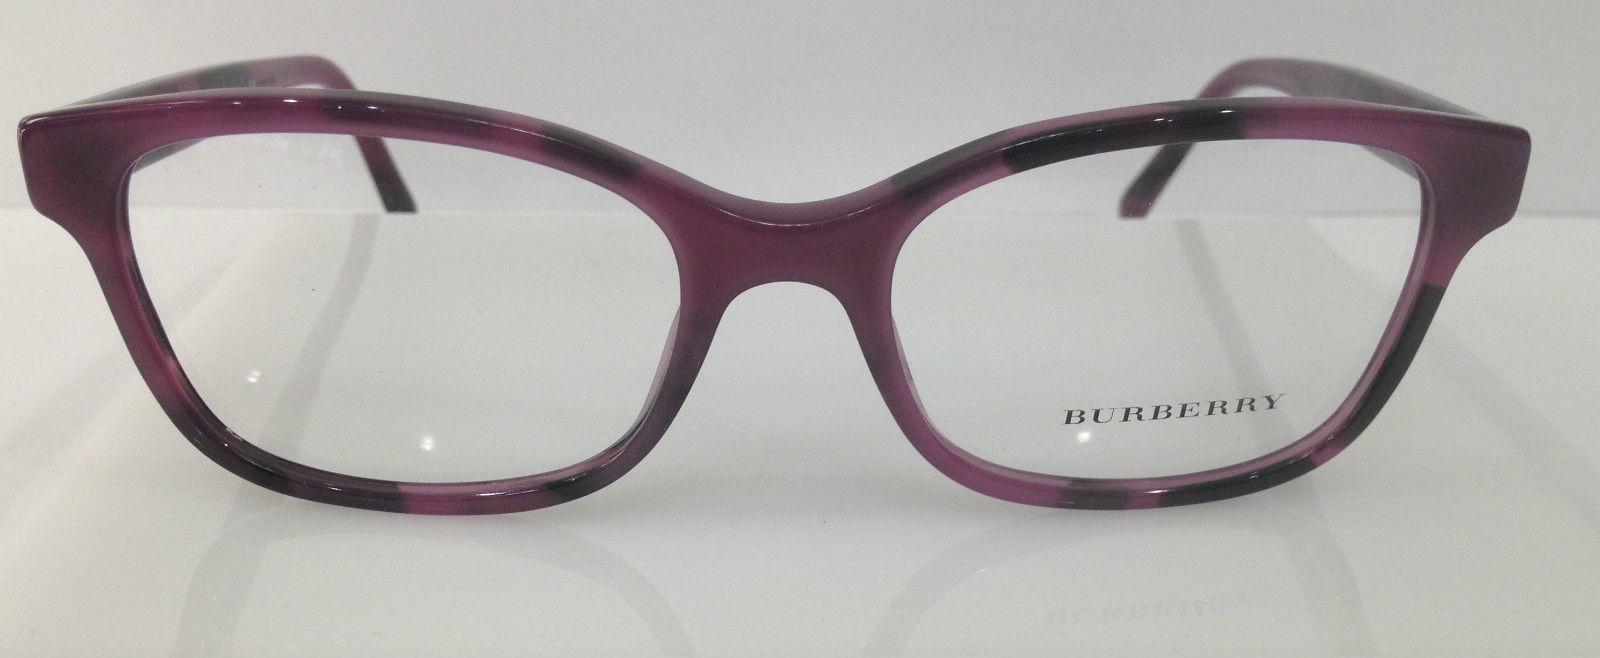 Burberry Glasses Frame Parts : BURBERRY B 2201 COL 3519 HAVANA PURPLE PLASTIC EYEGLASSES ...